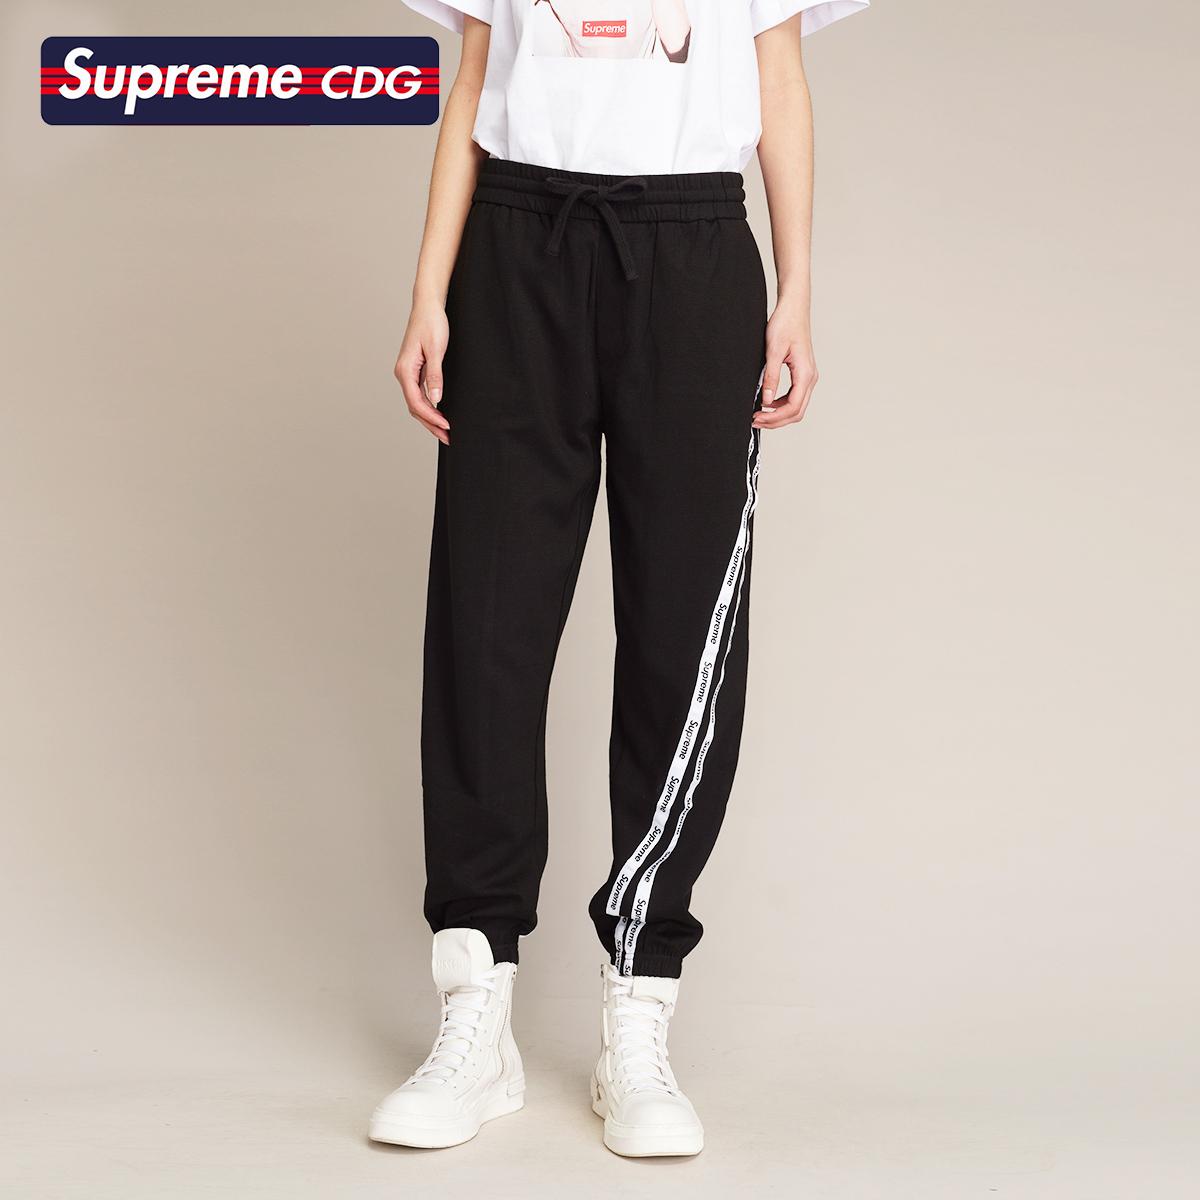 Supreme CDG 2020年春季新款 街头休闲直筒裤男女同款运动裤卫裤